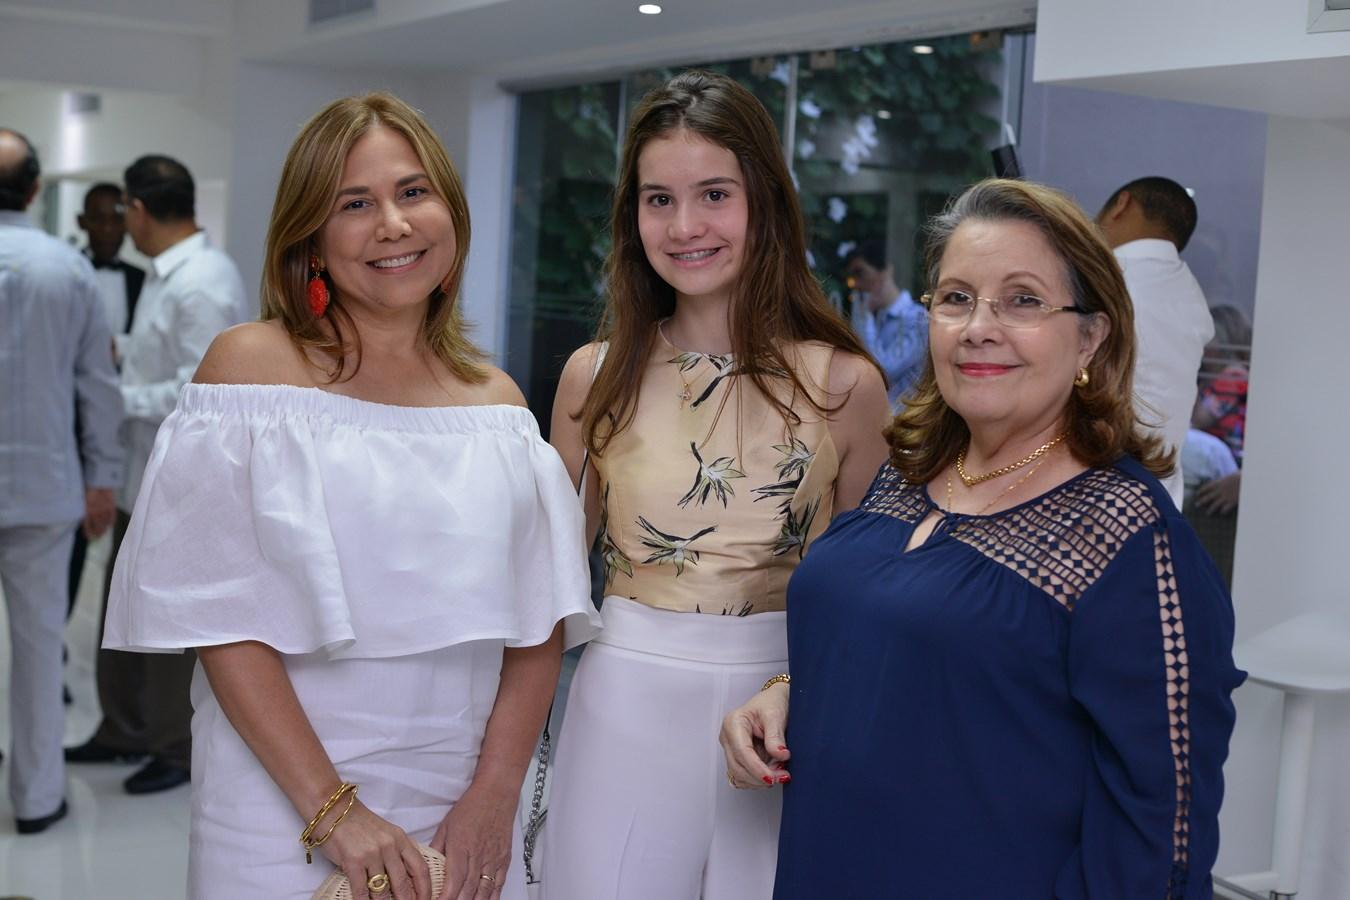 Alina Abreu,Sara Cuadra,Lidia de Nouel